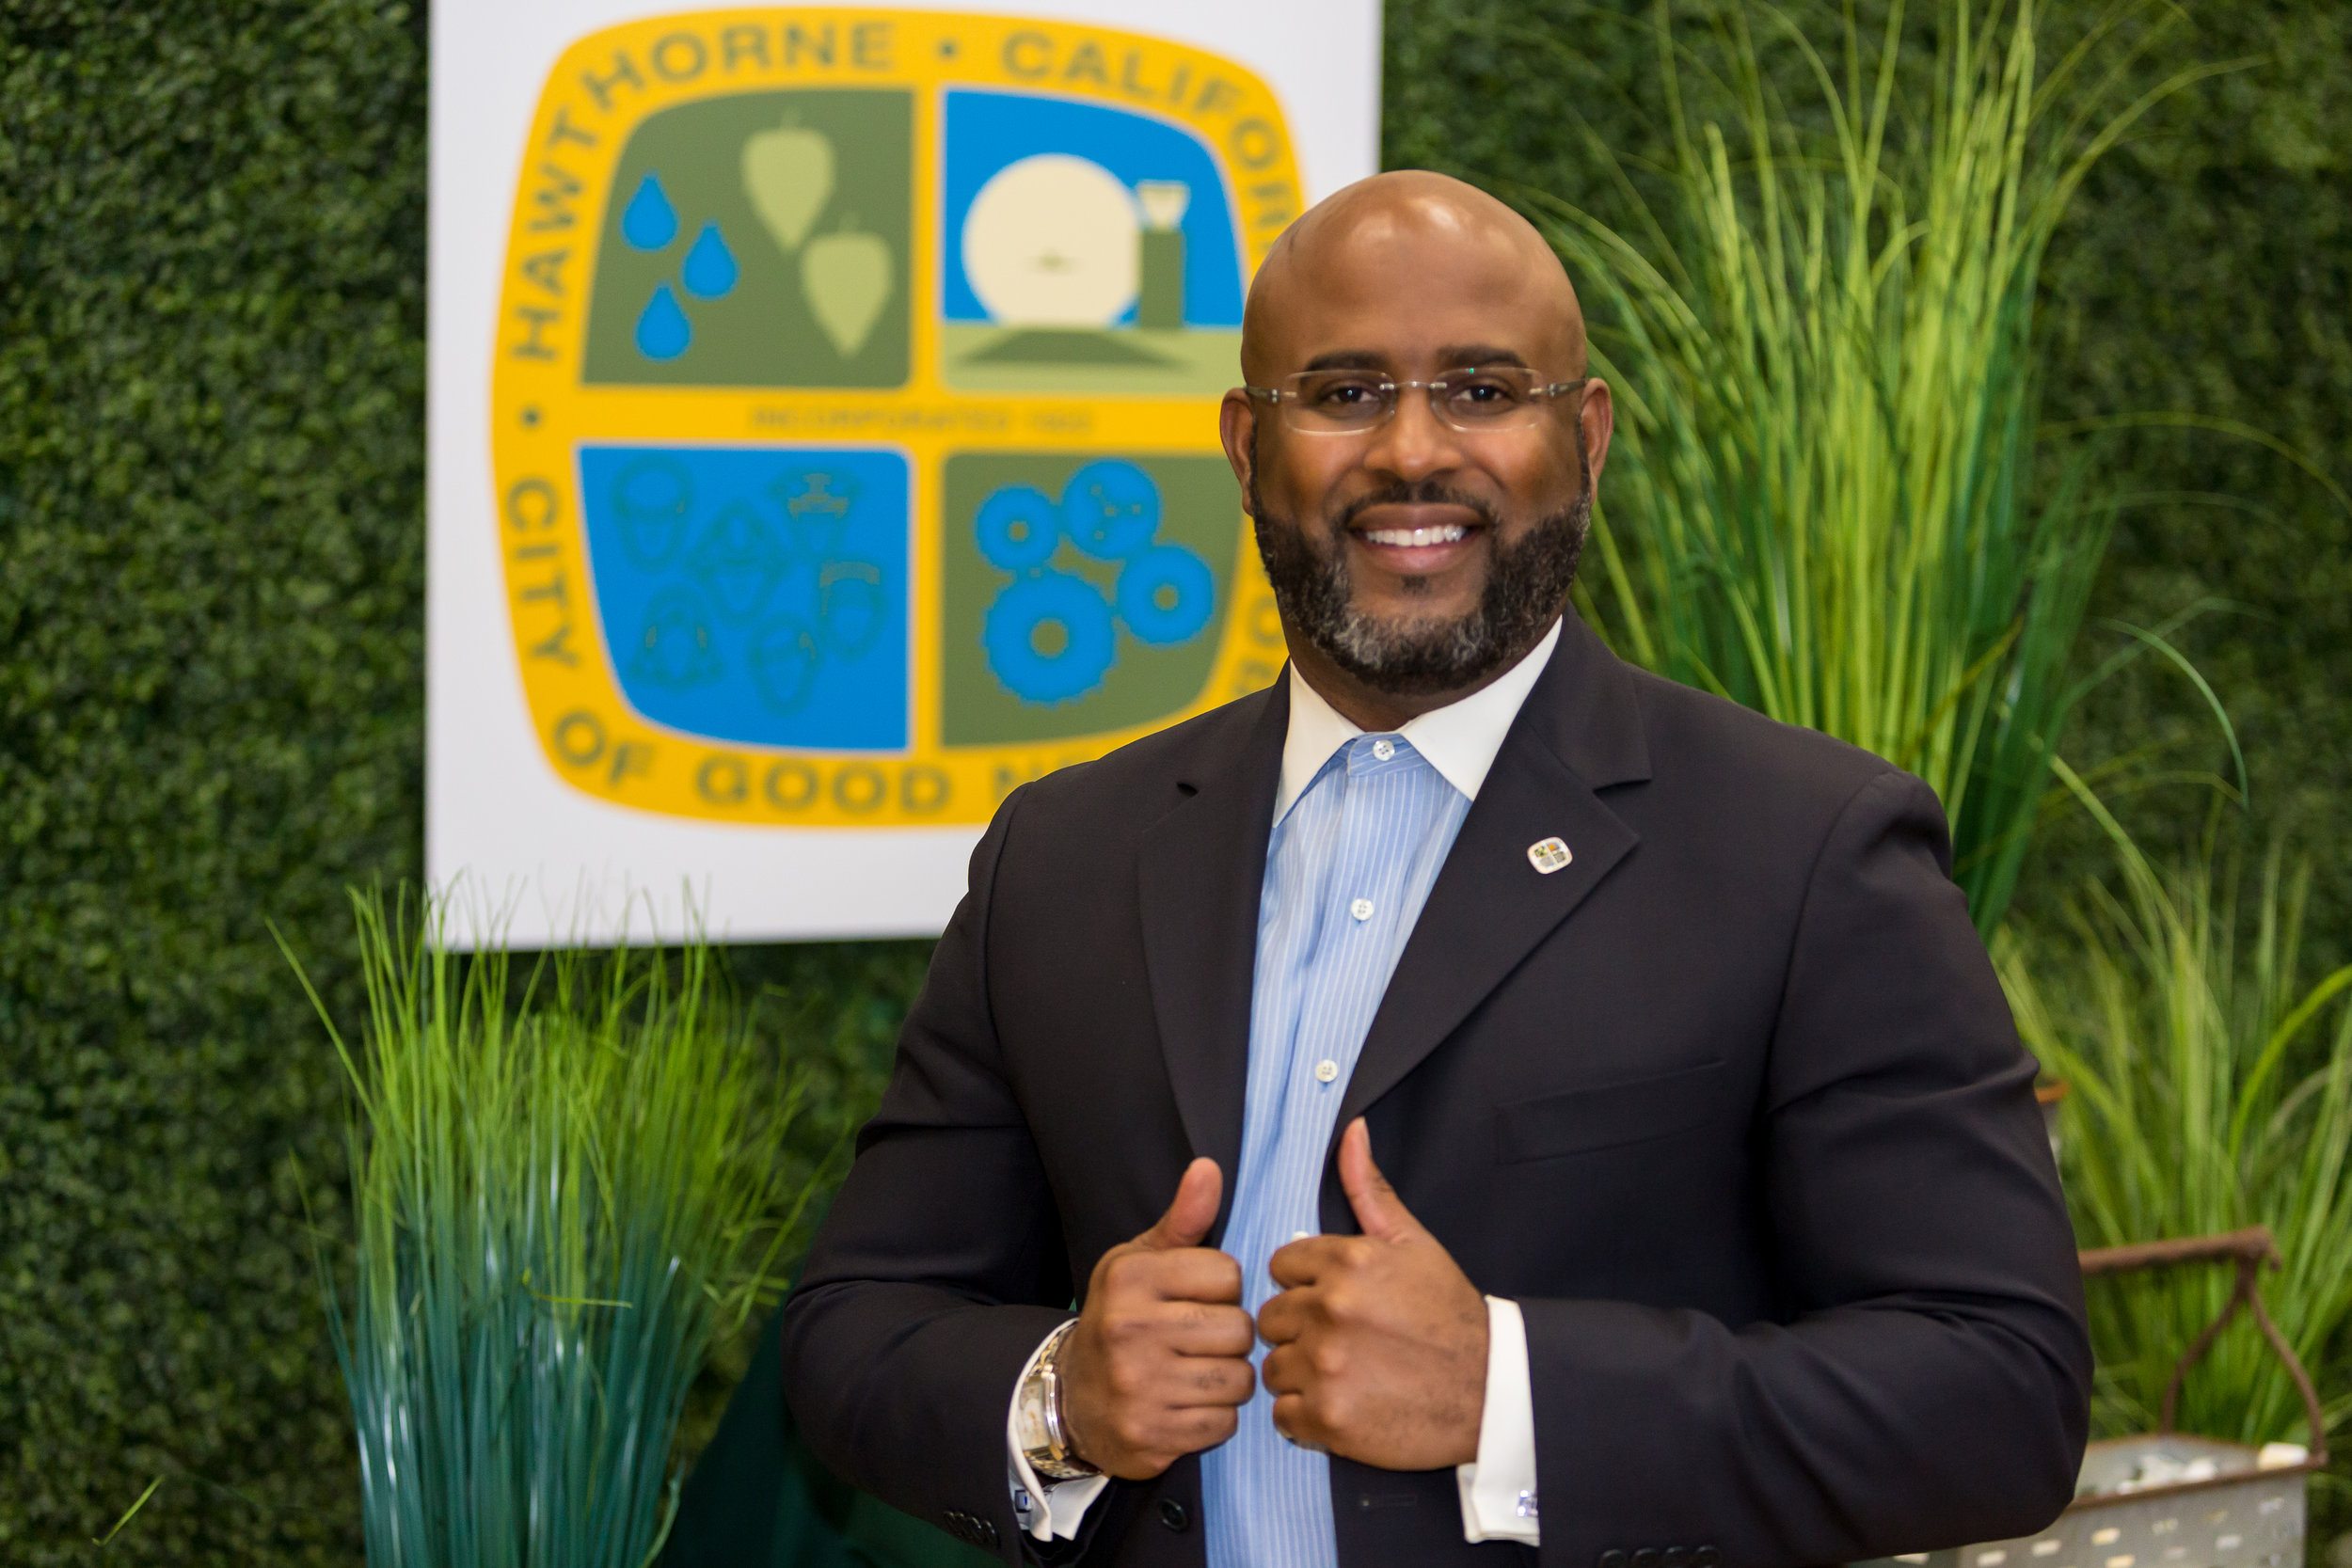 City Treasurer L. David Patterson